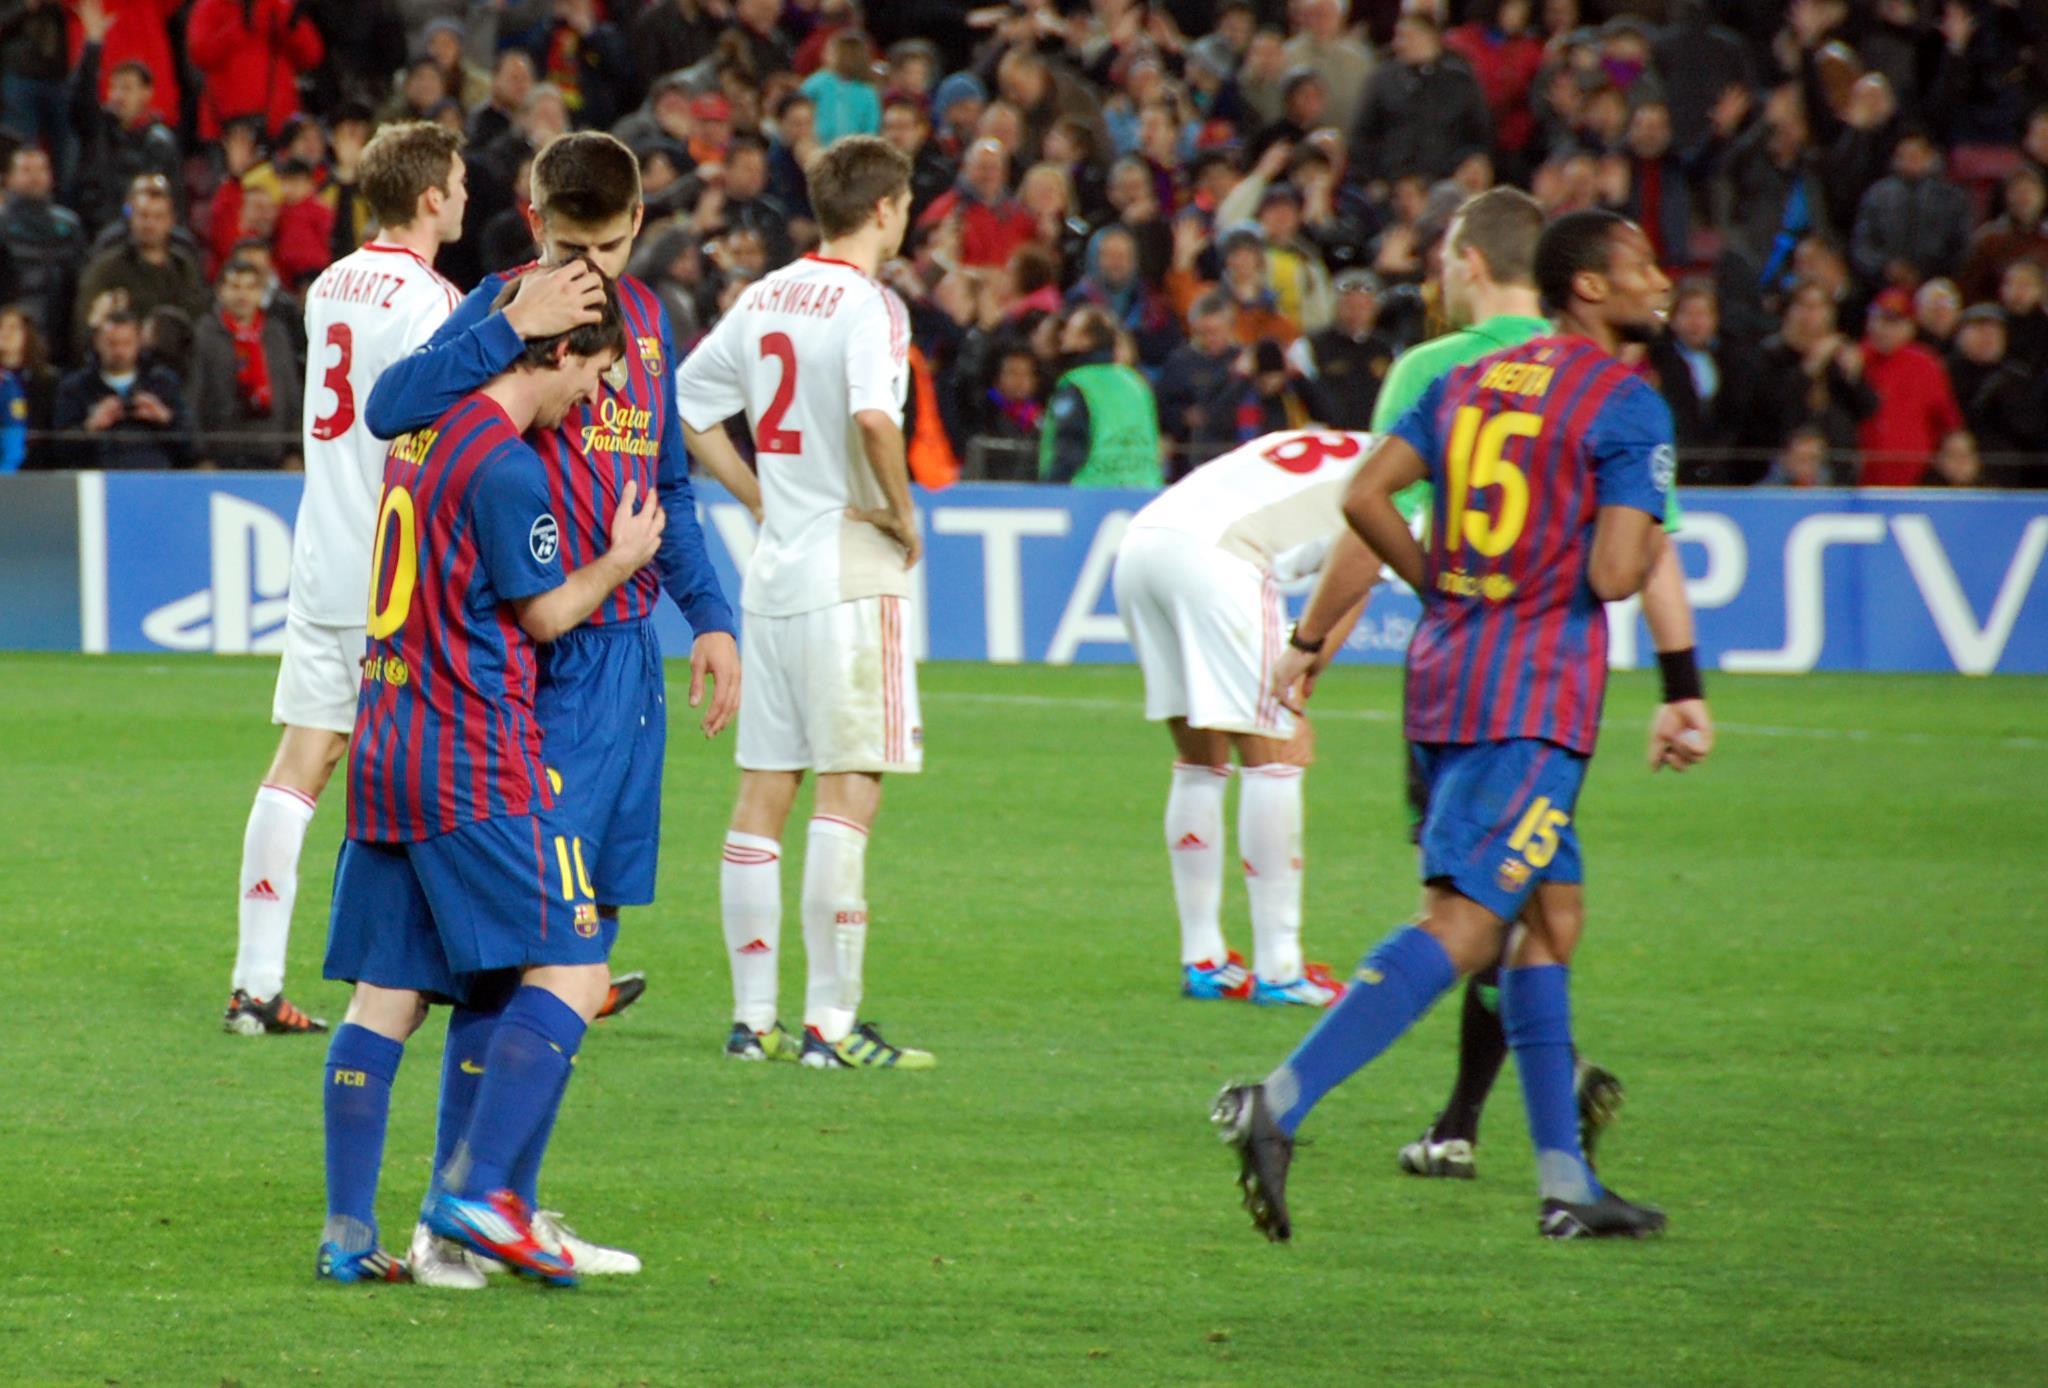 FC Barcelona - Bayer 04 Leverkusen, 7 mar 2012 (51).jpg English: FC Barcelona - Bayer 04 Leverkusen, 1/8 Final UEFA Champions League, Season